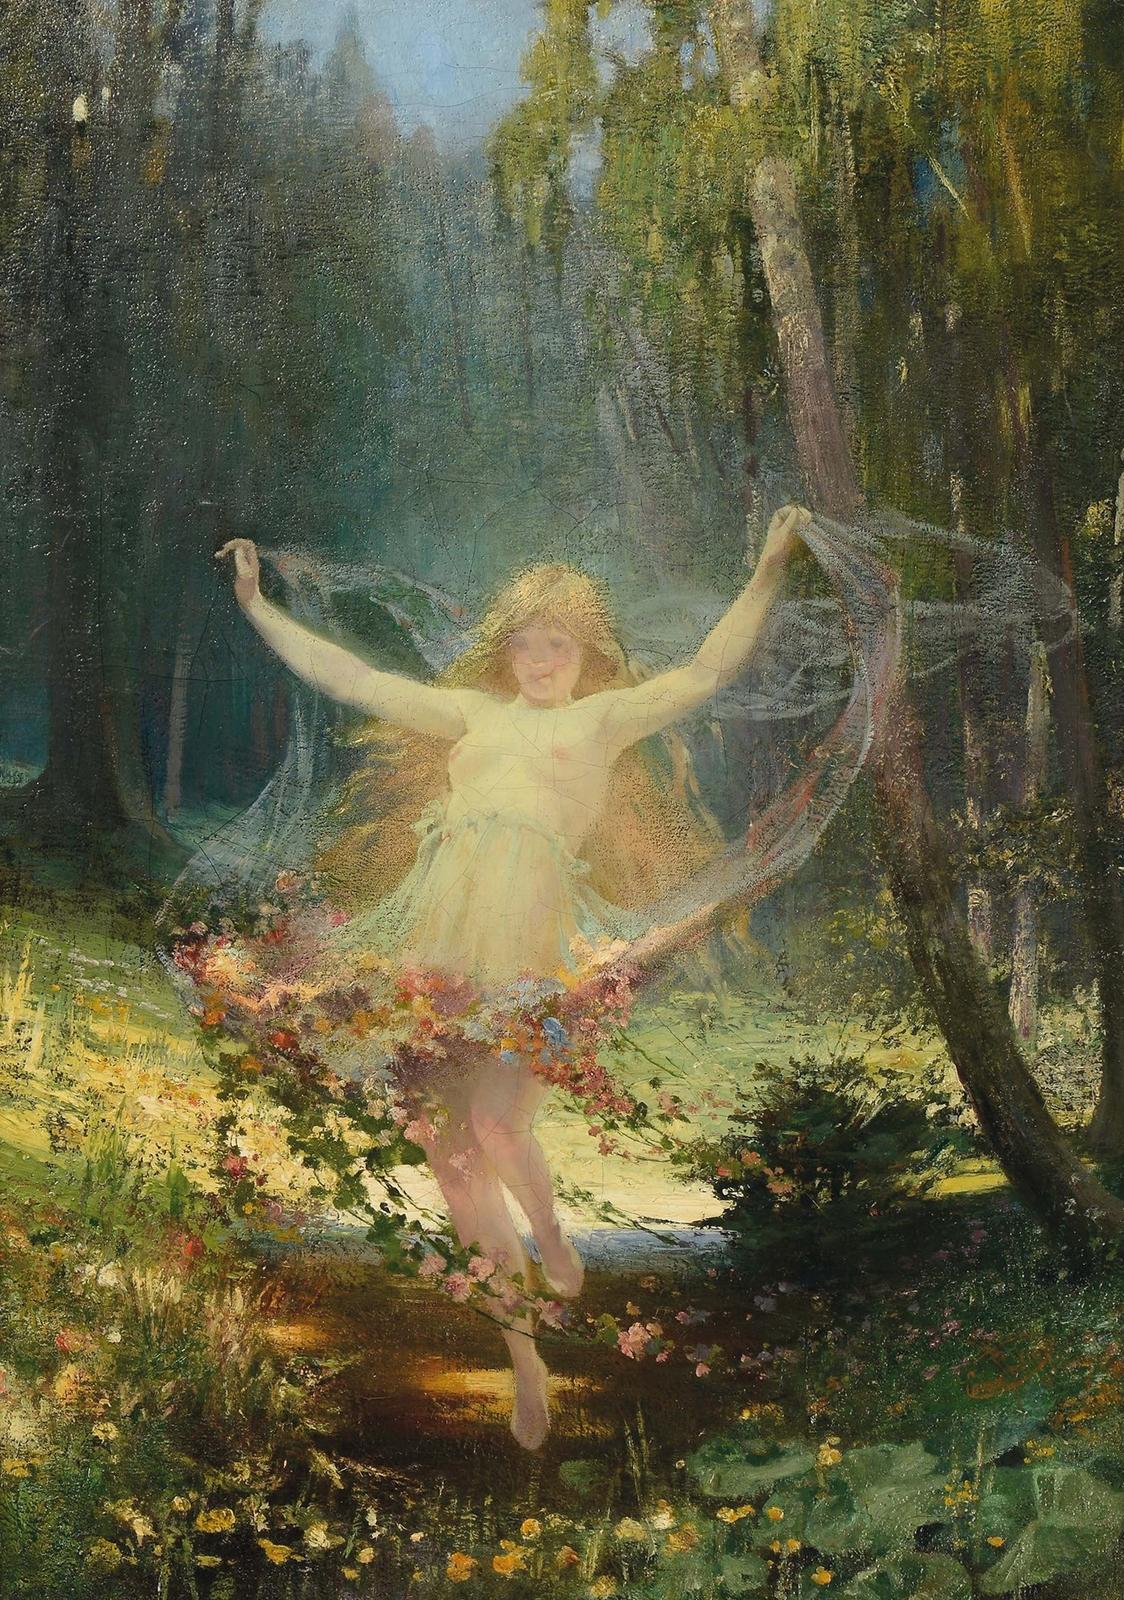 Caesar Philipp, 1859-1930 (Германия)_Аллегория весны (Allegory of Spring)_85 х 61_х.,м._Частное собрание.jpg